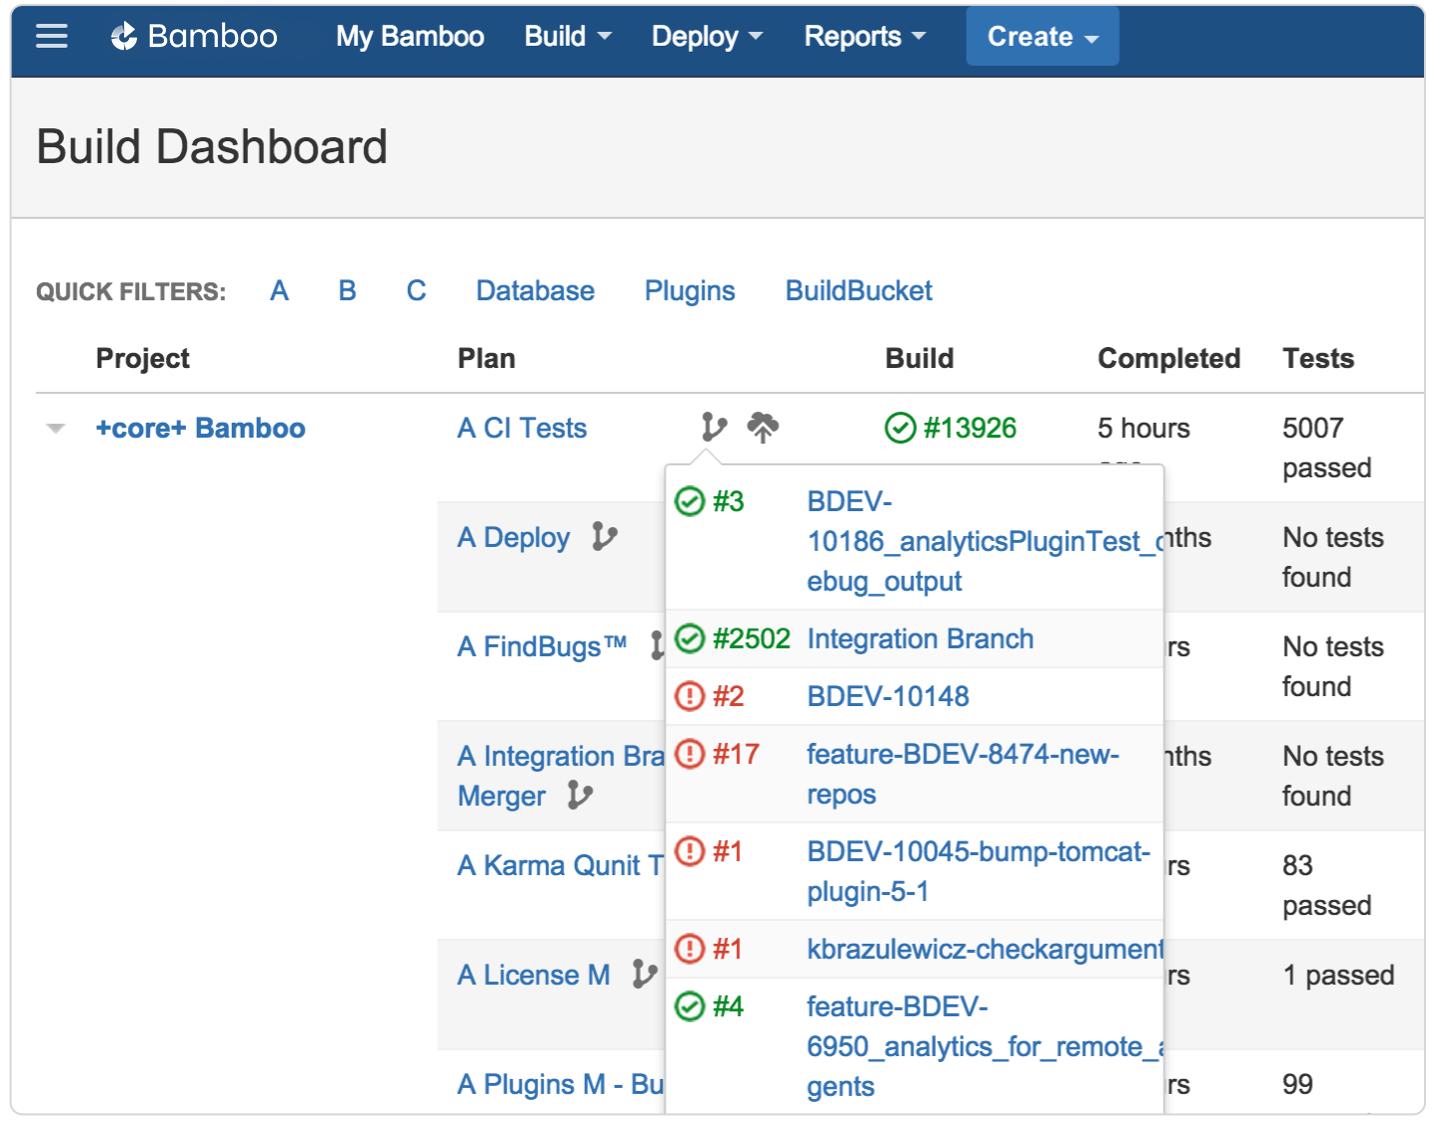 Bamboo build dashboard plan branches screenshot